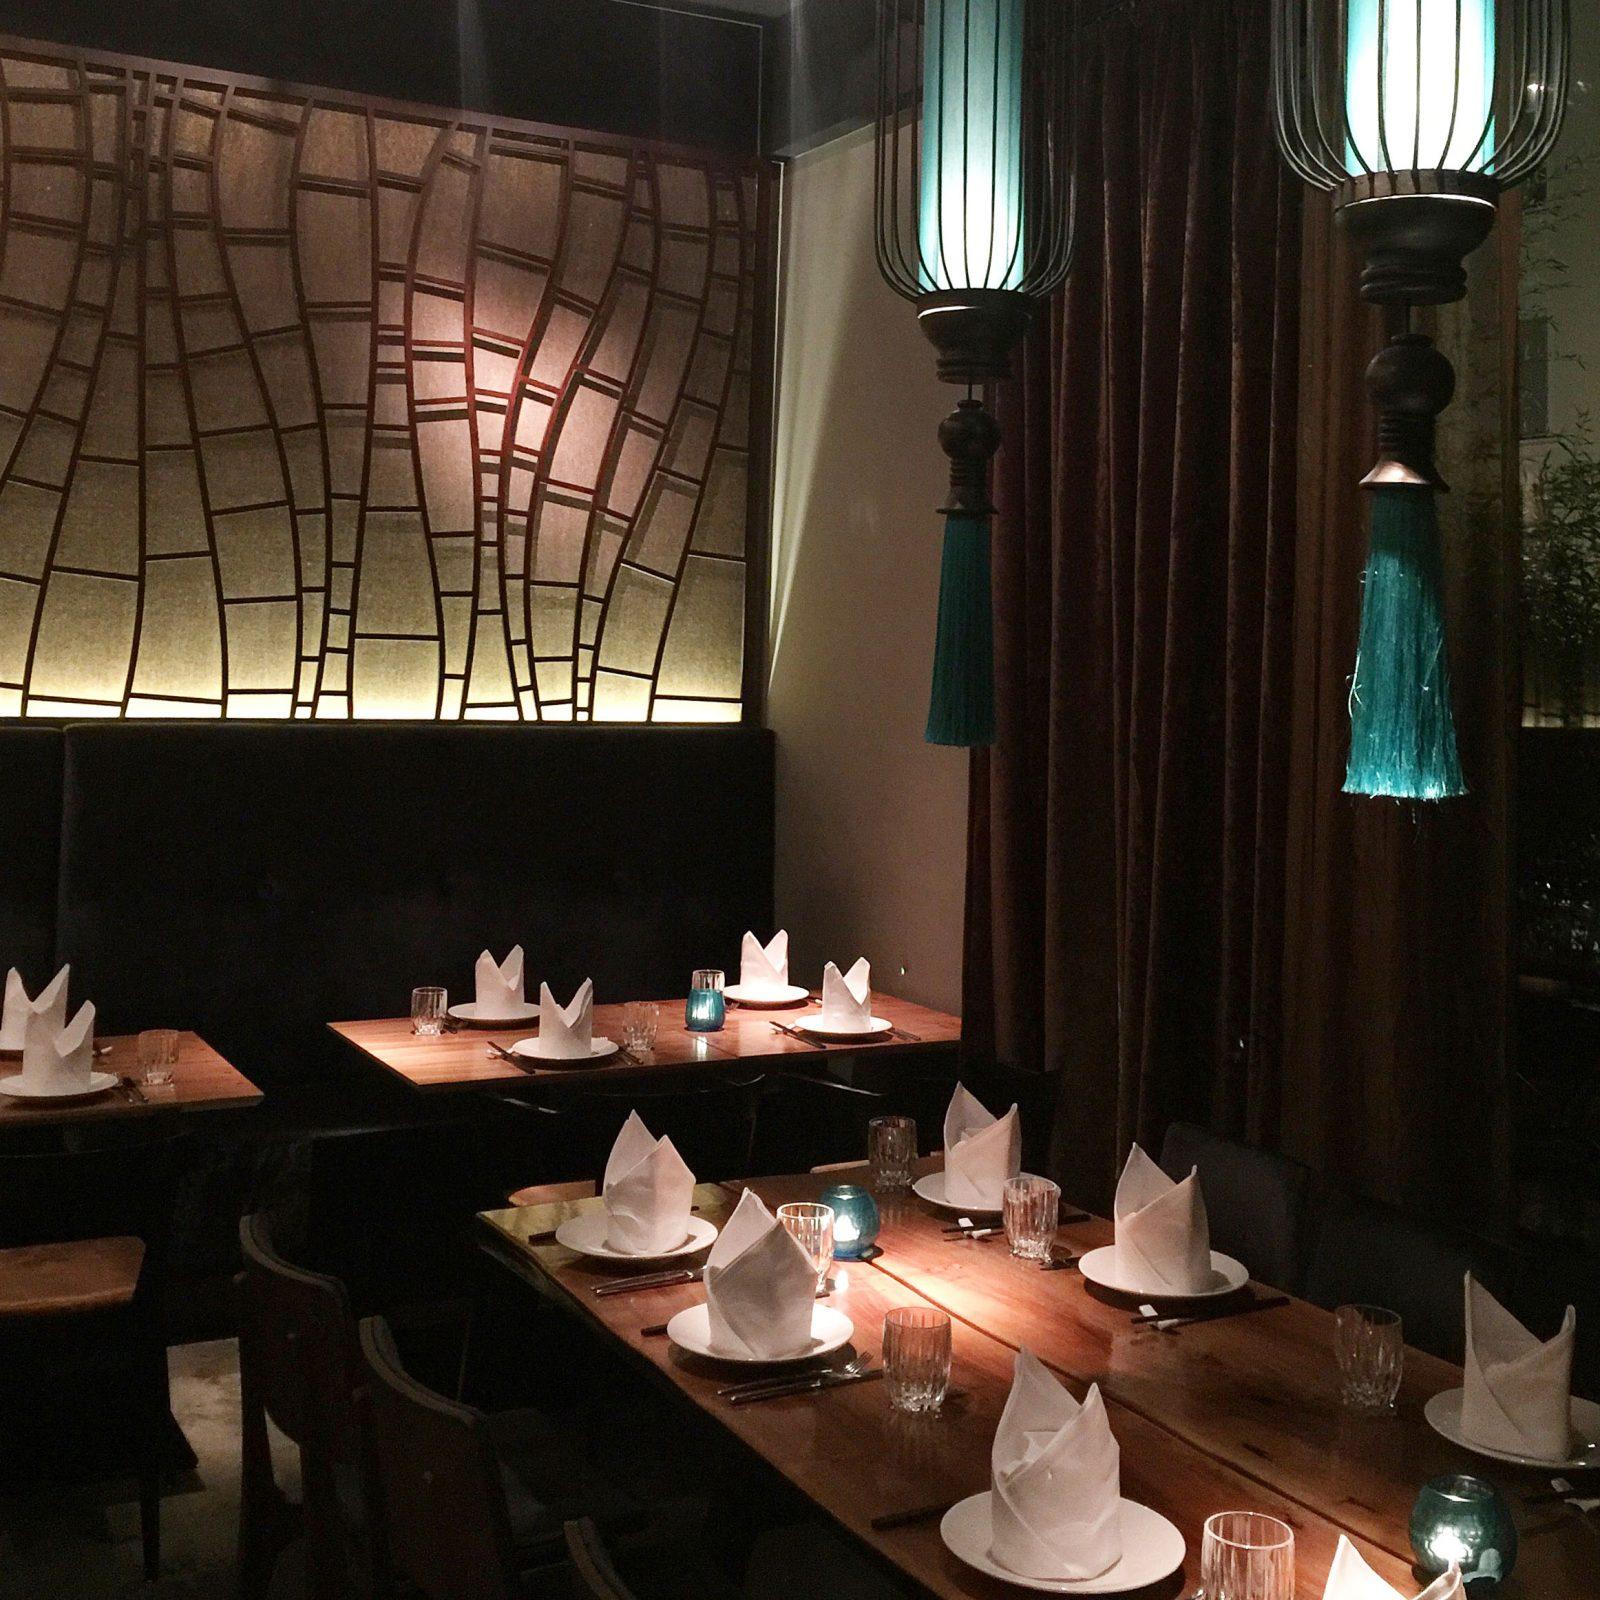 Interior Spots Munich Conchinchina Restaurant on Lifetime-Pieces.com